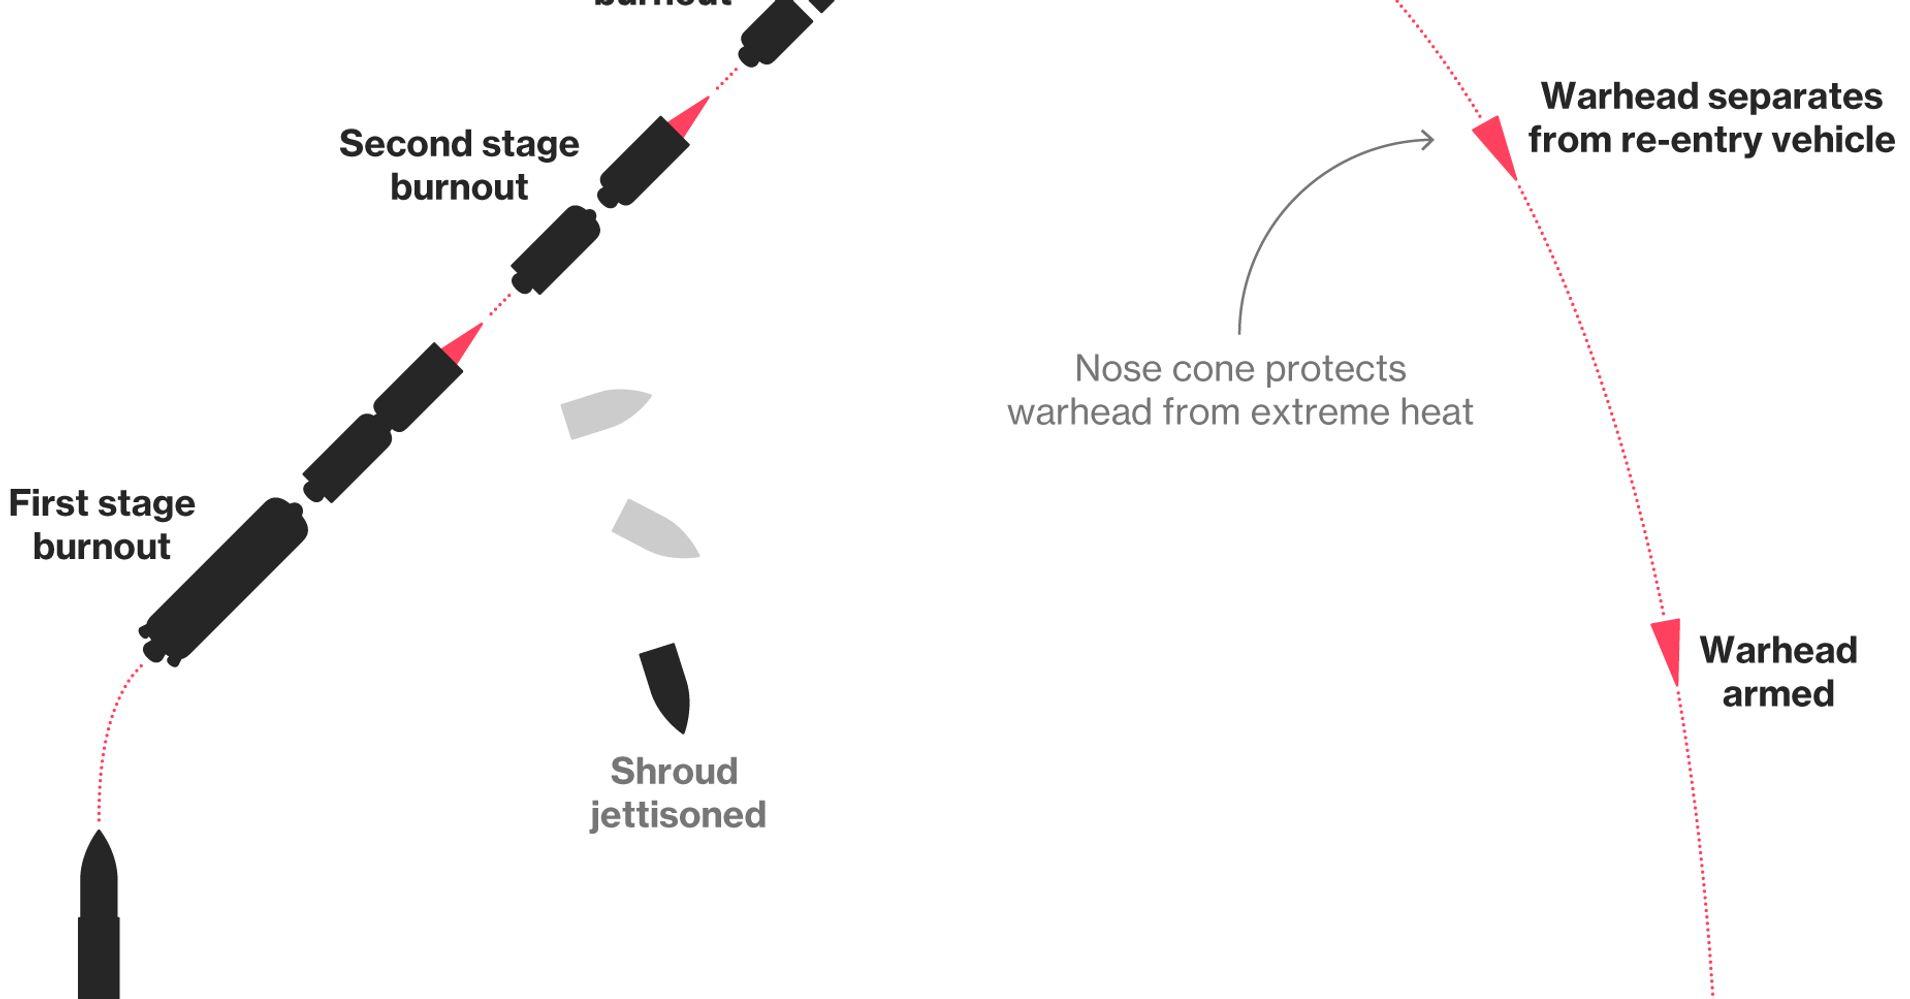 Threatening Thursday - North Korea Threatens to Nuke Japan and US - Markets Shrug